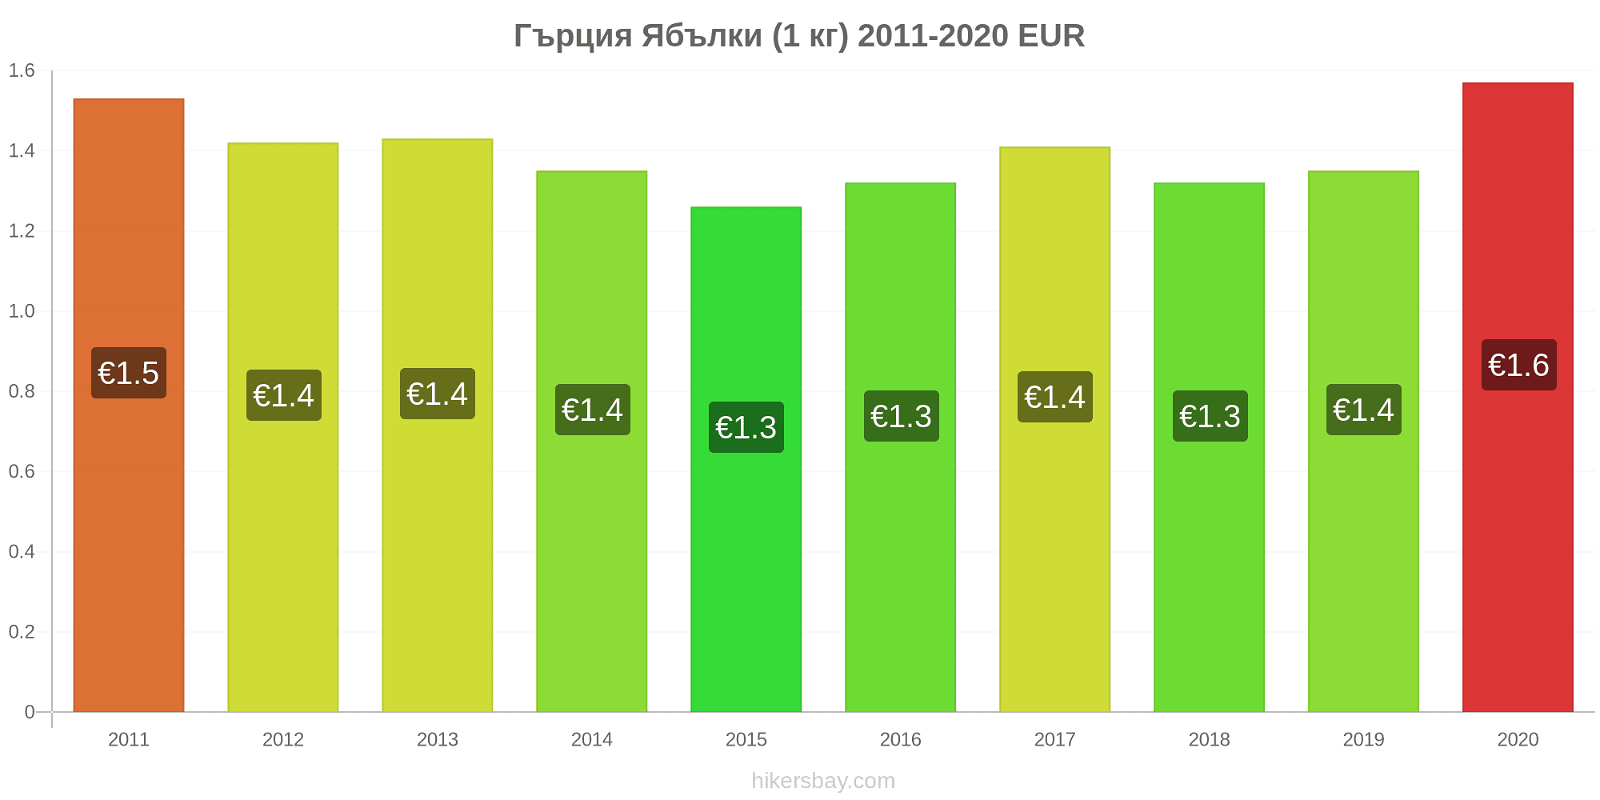 Гърция ценови промени Ябълки (1 кг) hikersbay.com